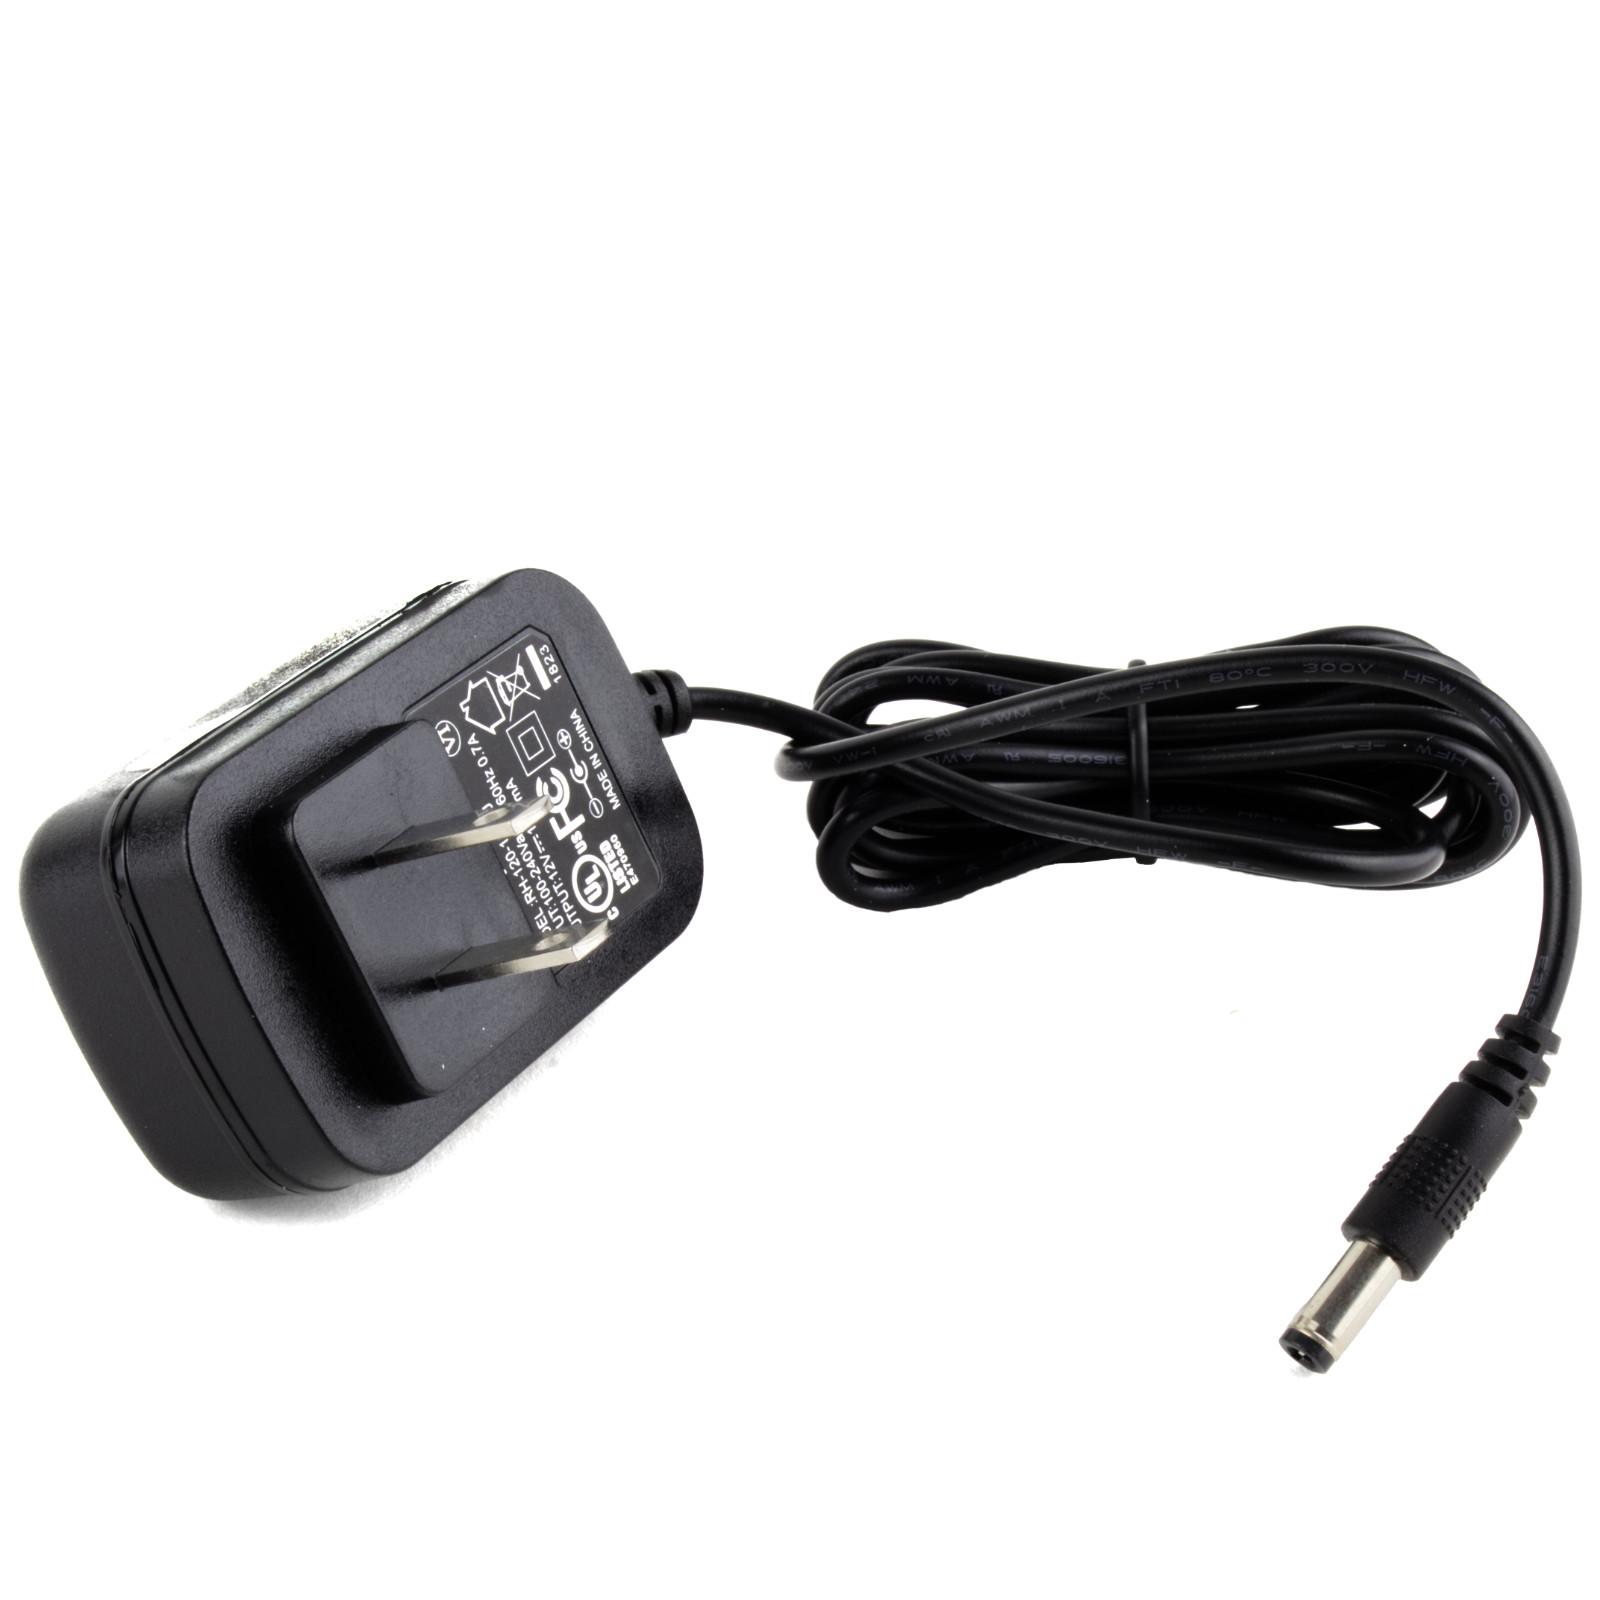 Blackmagic Design Mini Converter Sdi Distribution 4k Compatible Power Supply Plug Charger